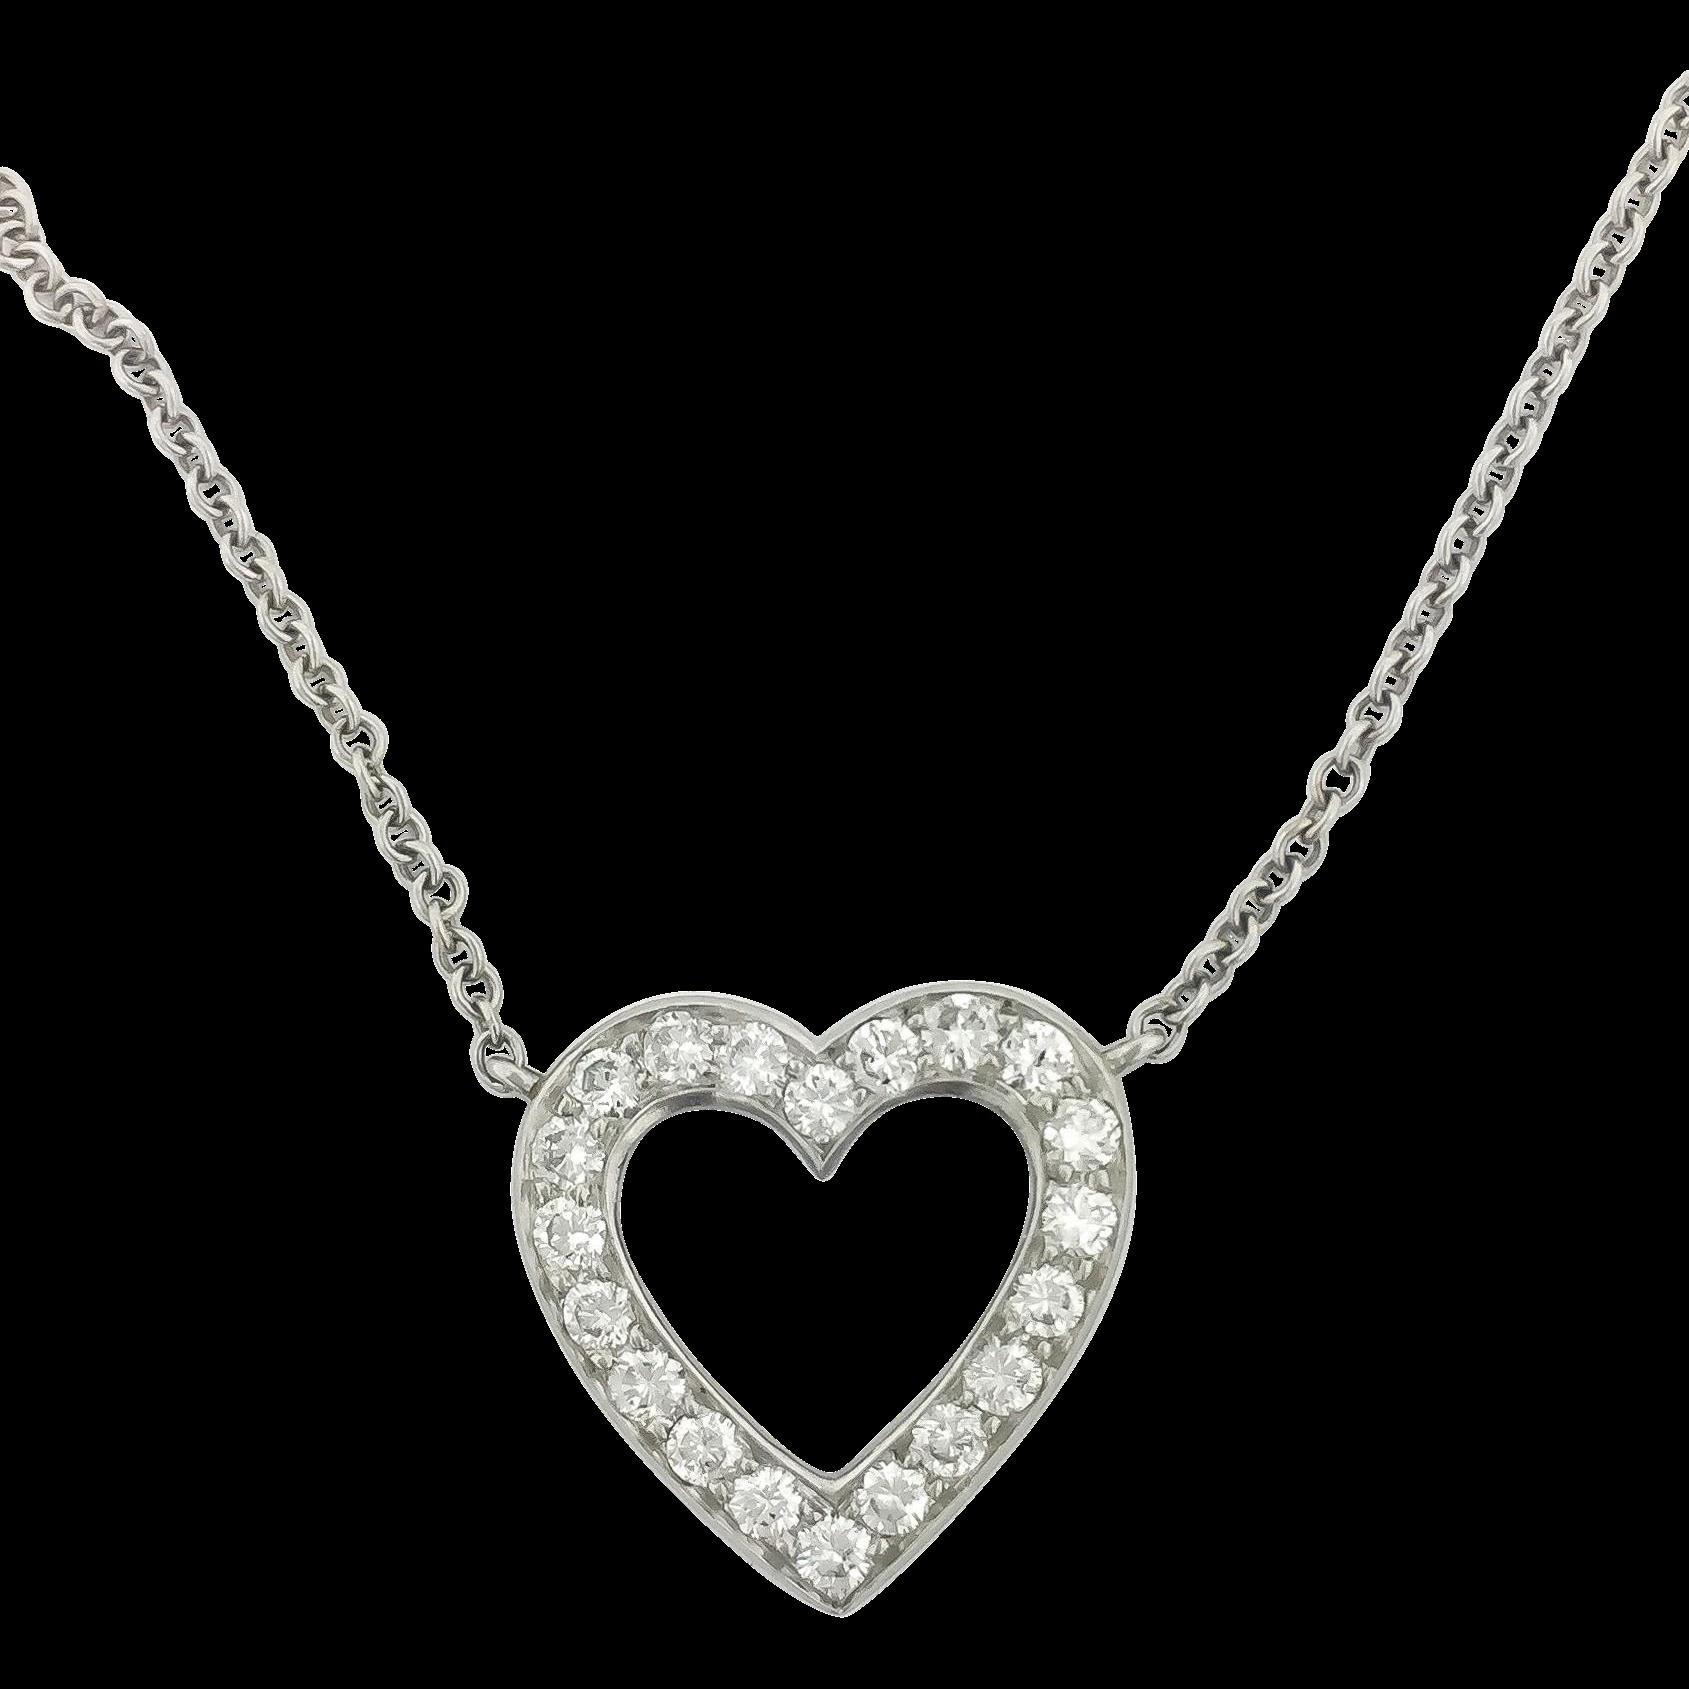 Platinum tiffany diamond heart estate necklace from platinum tiffany diamond heart estate necklace aloadofball Image collections